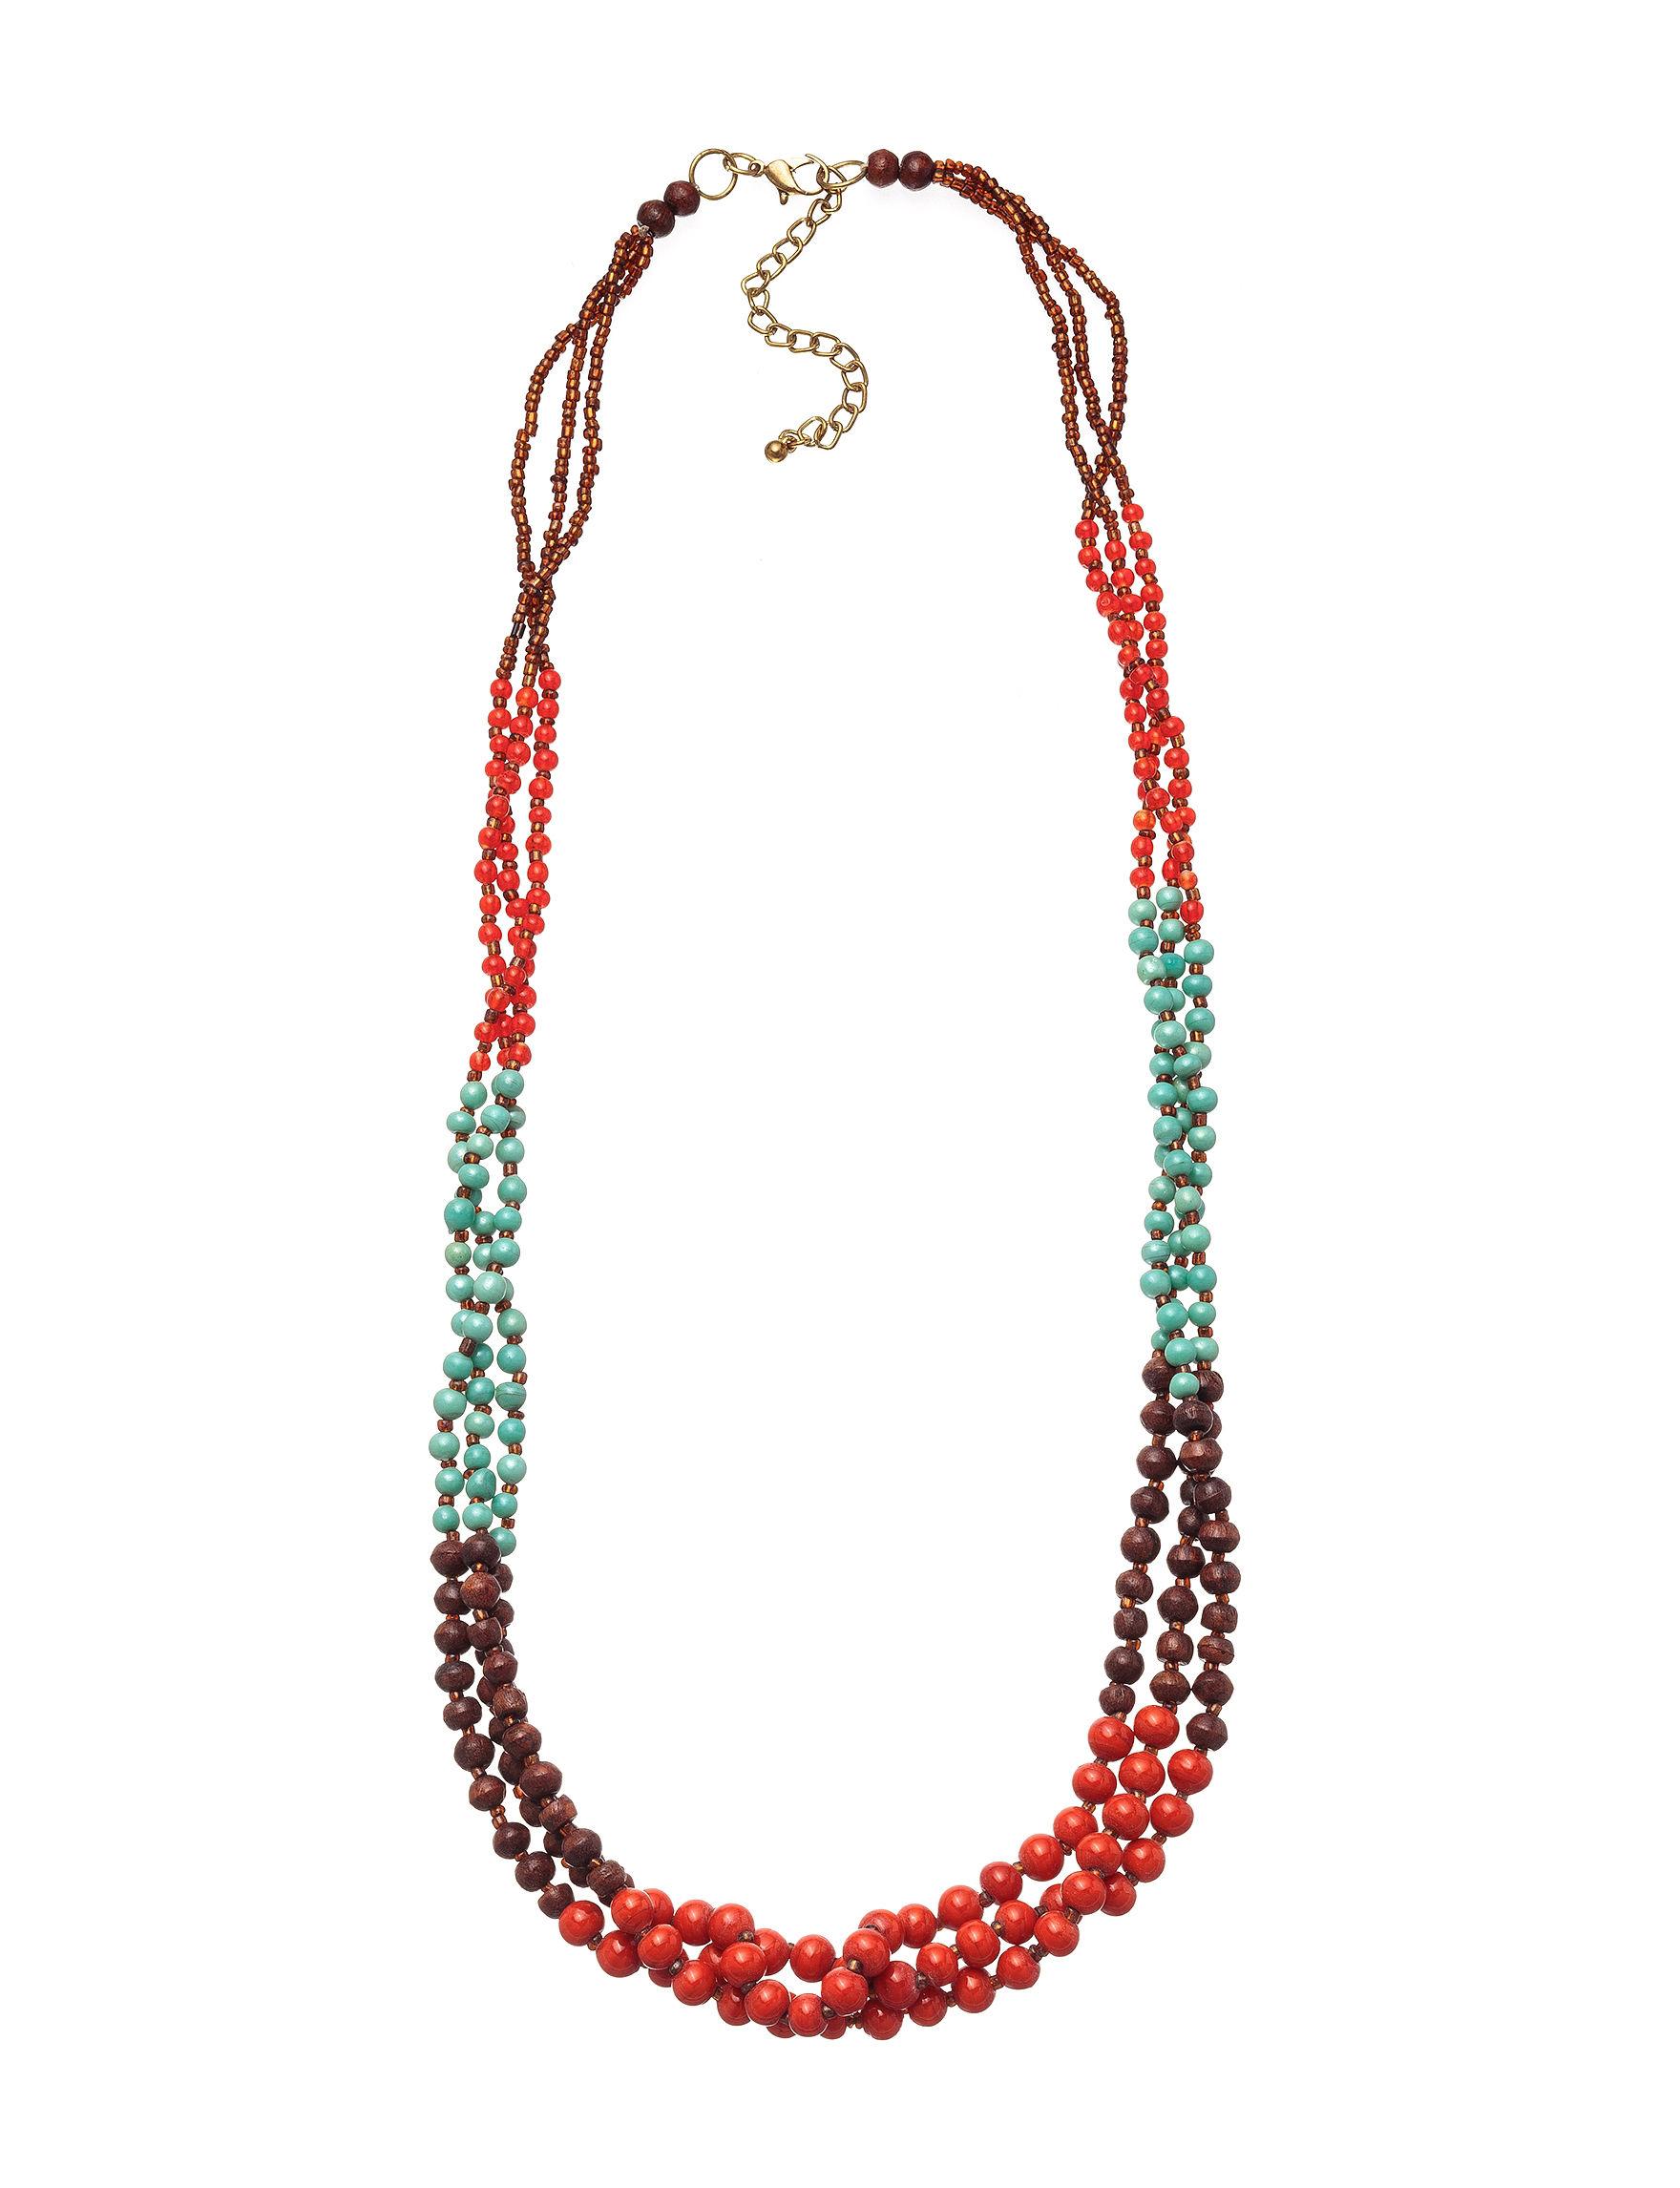 Hannah Orange Multi Necklaces & Pendants Fashion Jewelry